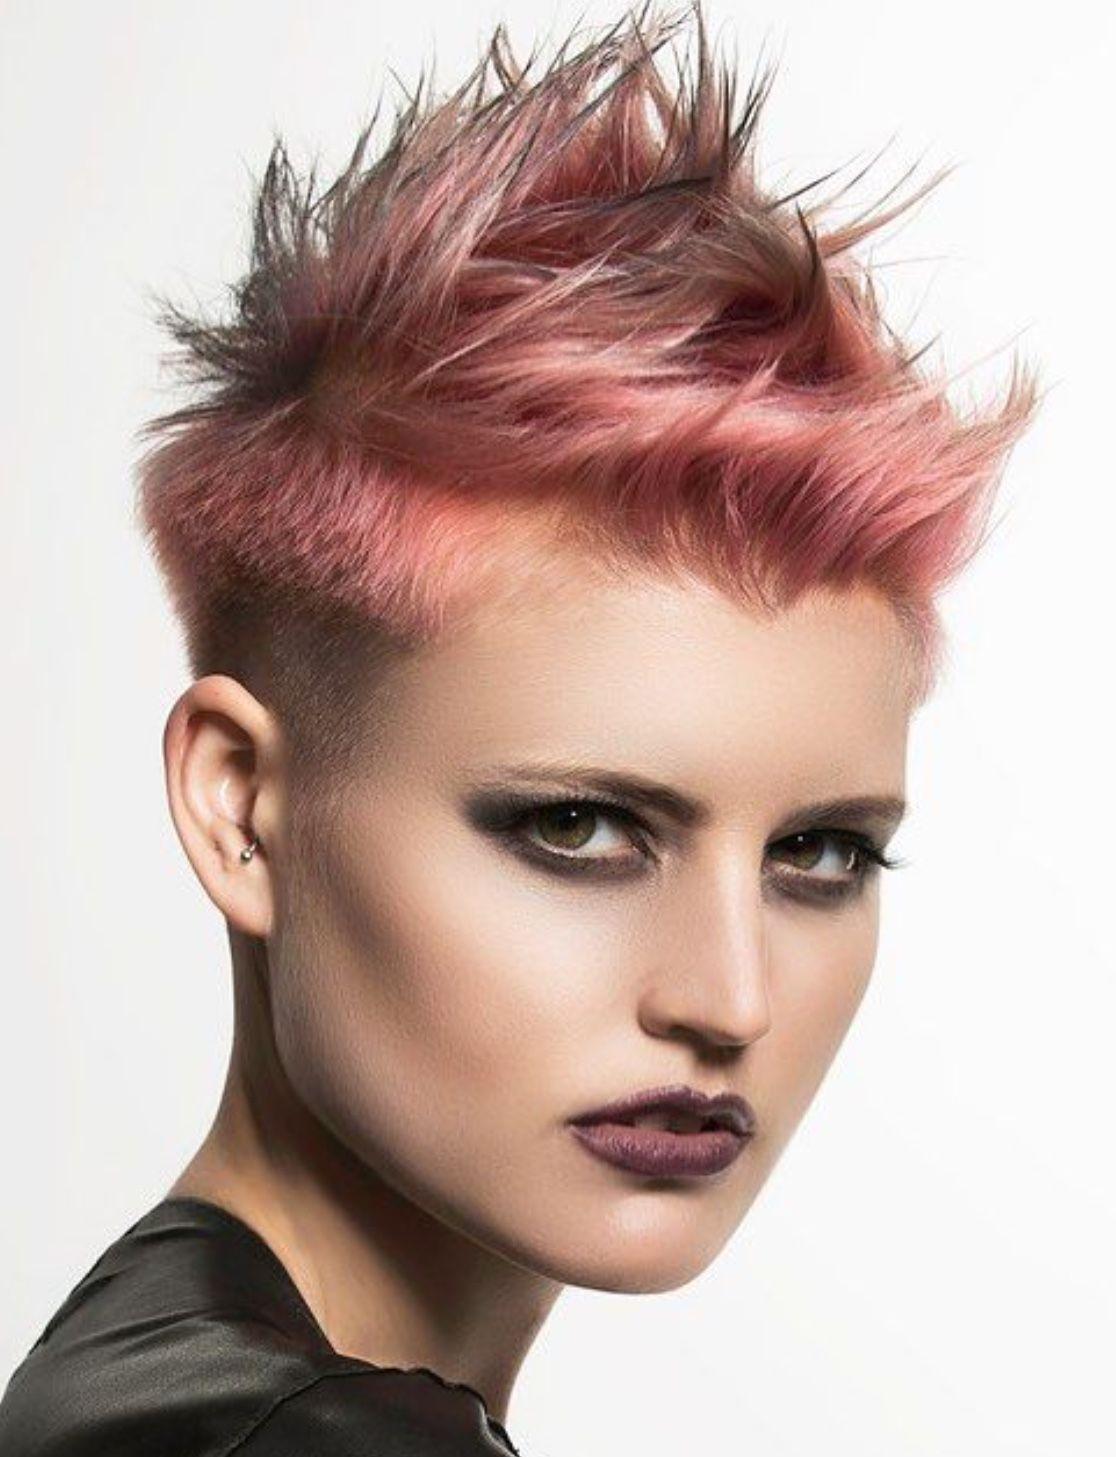 Pin by kim belknap on hair in pinterest hair hair styles